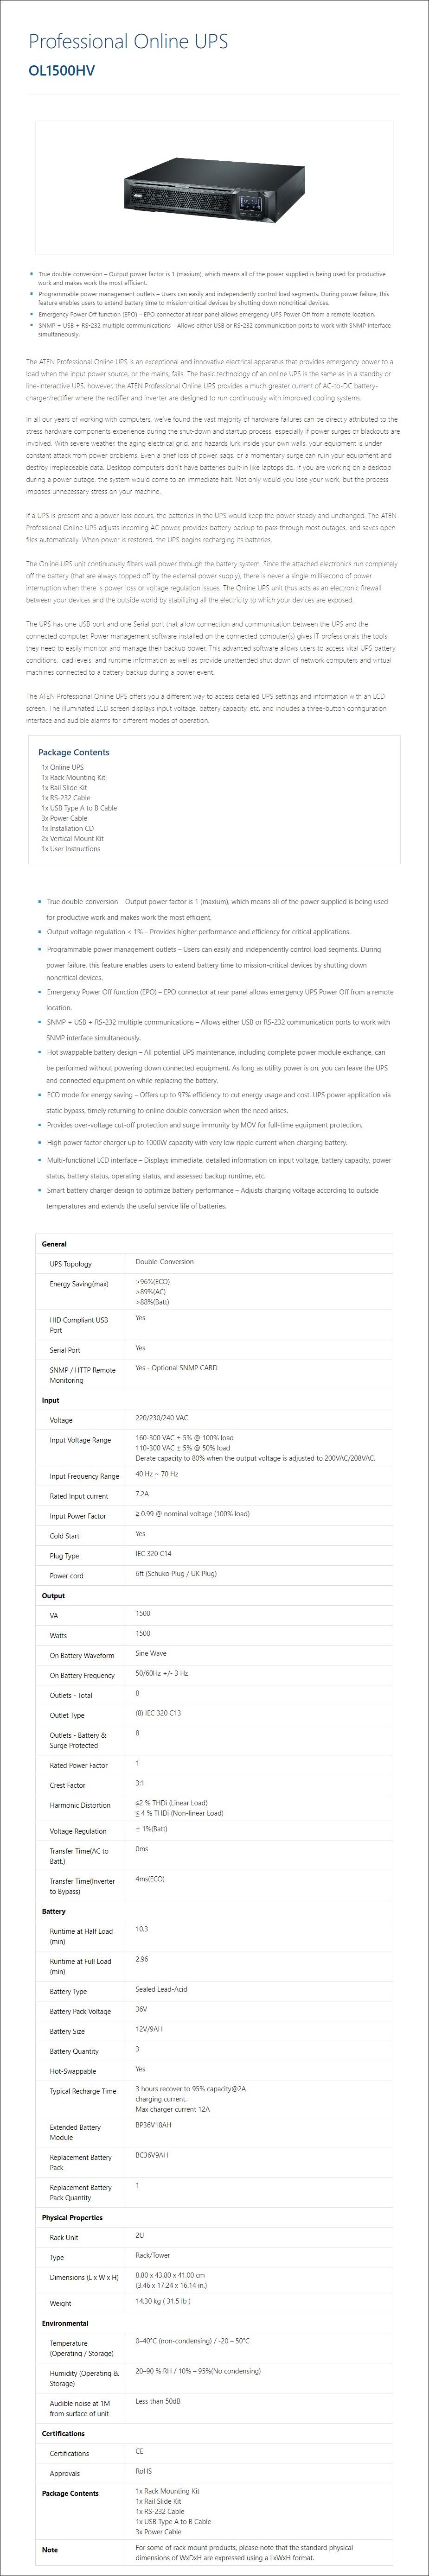 ATEN OL1500HV 1500VA / 1500W Professional Online UPS - Overview 2